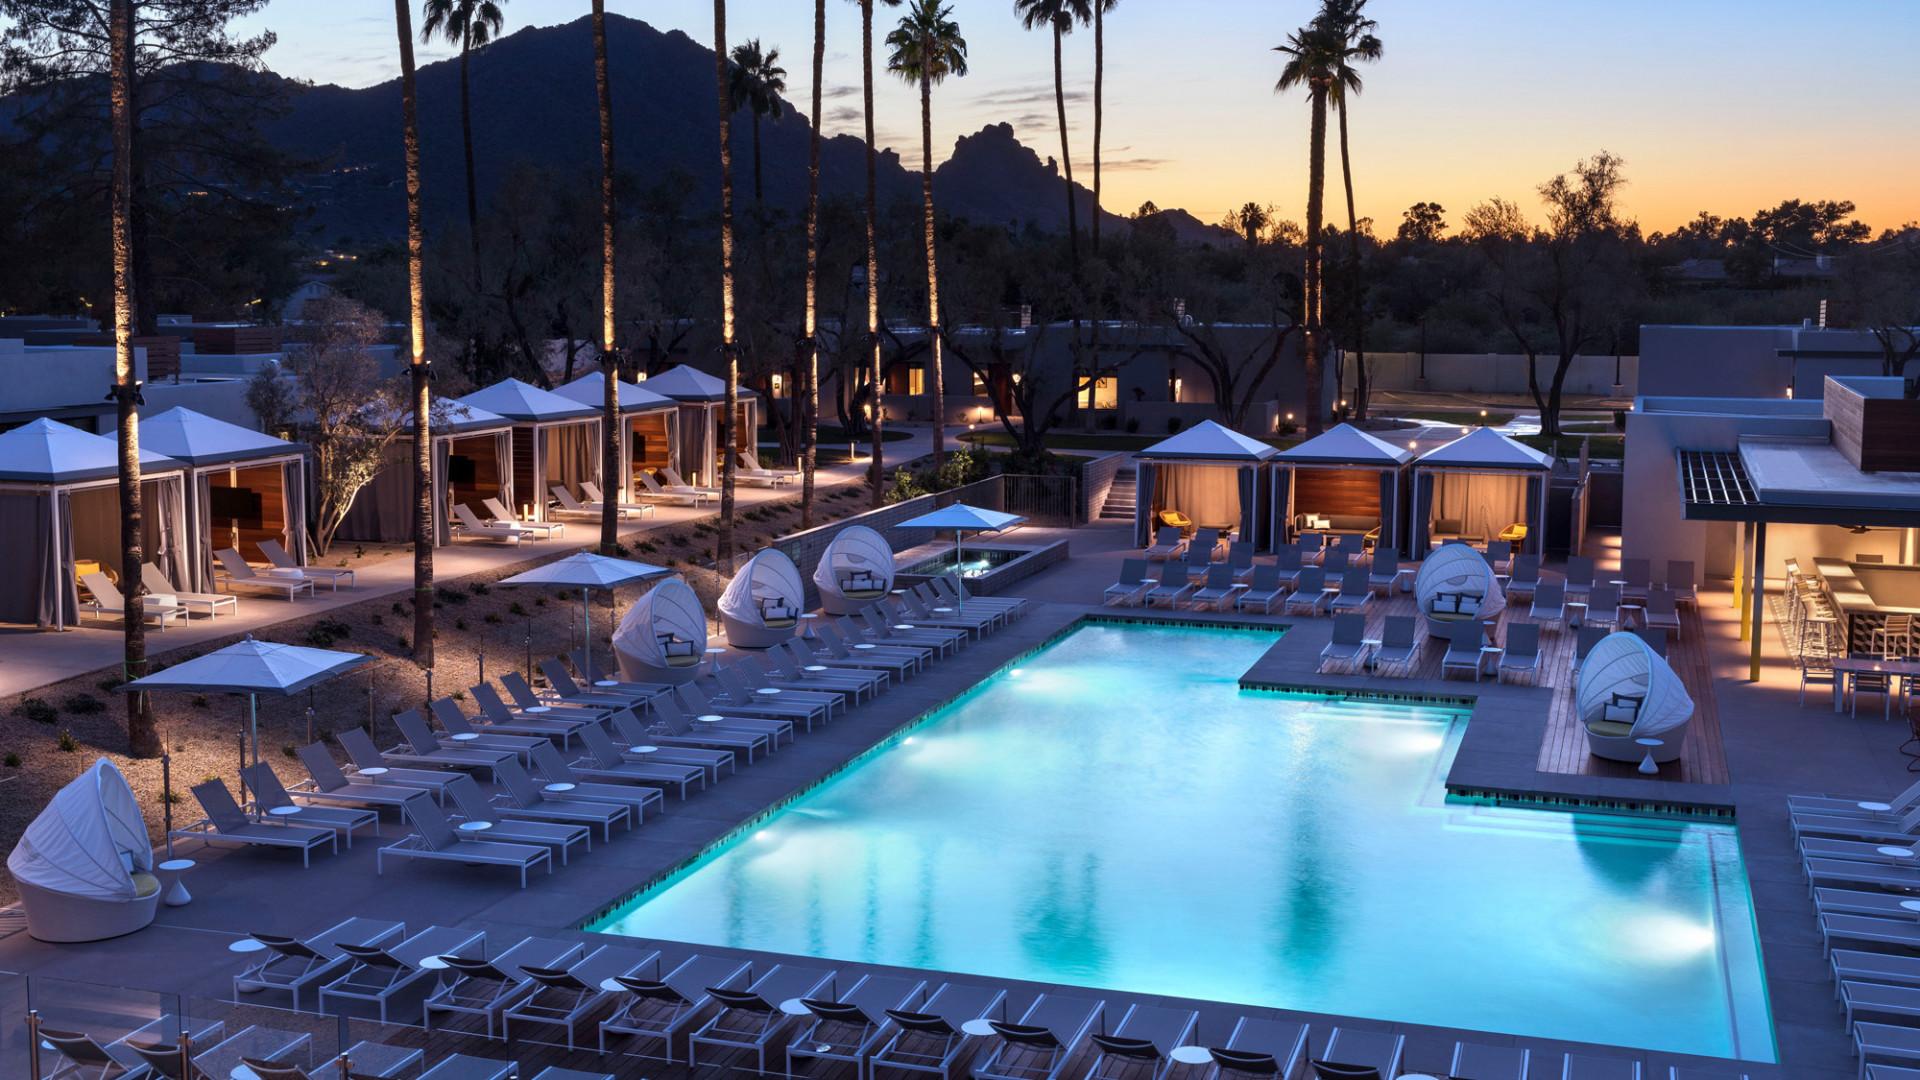 World's Most Awesome Swimming Pools: Andaz Scottsdale Resort & Bungalows Phoenix